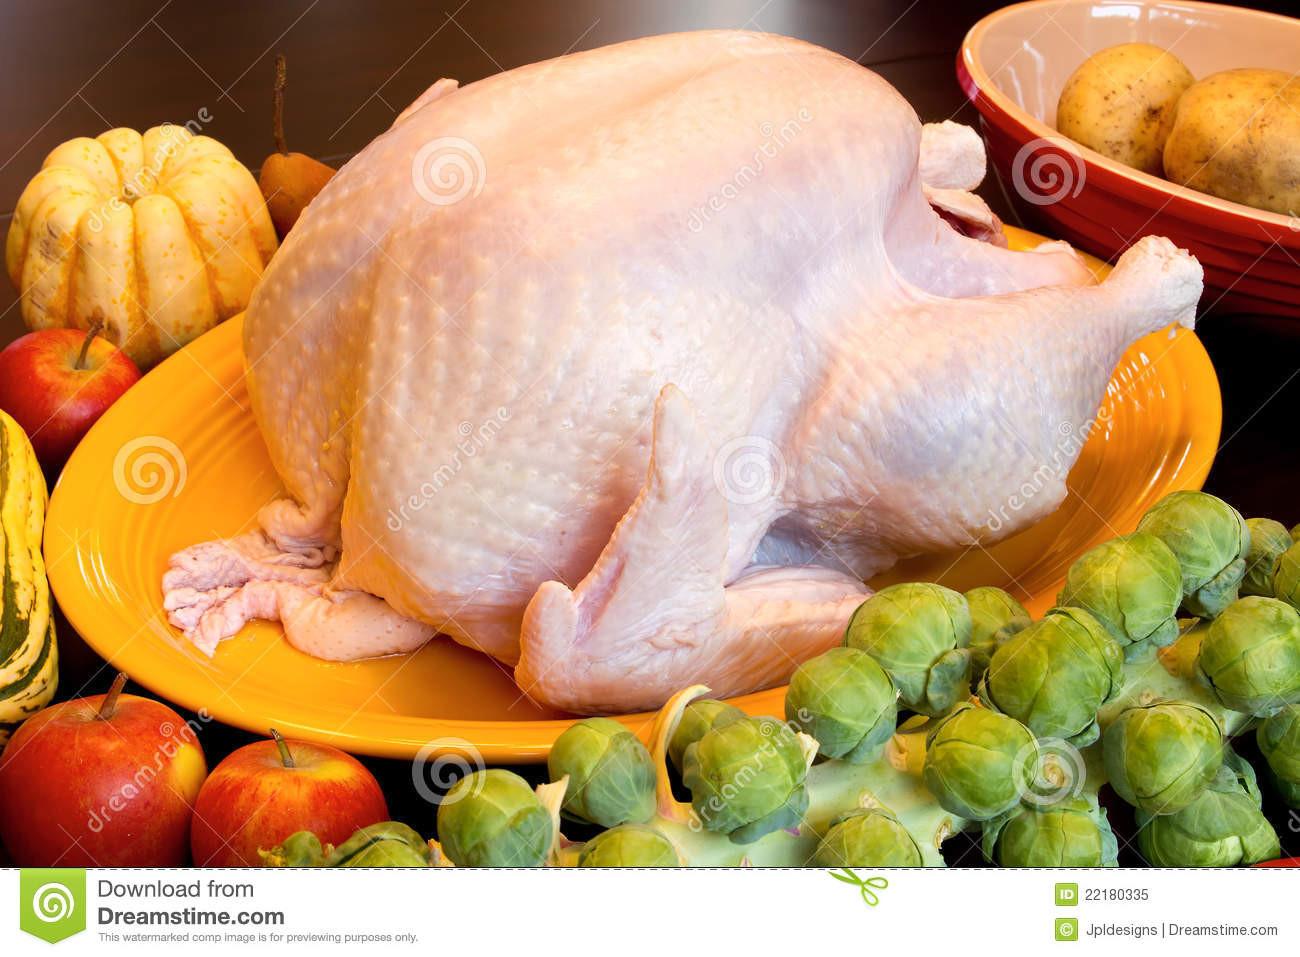 Ingredients For Thanksgiving Turkey  Thanksgiving Turkey Dinner Cooking Ingre nts Royalty